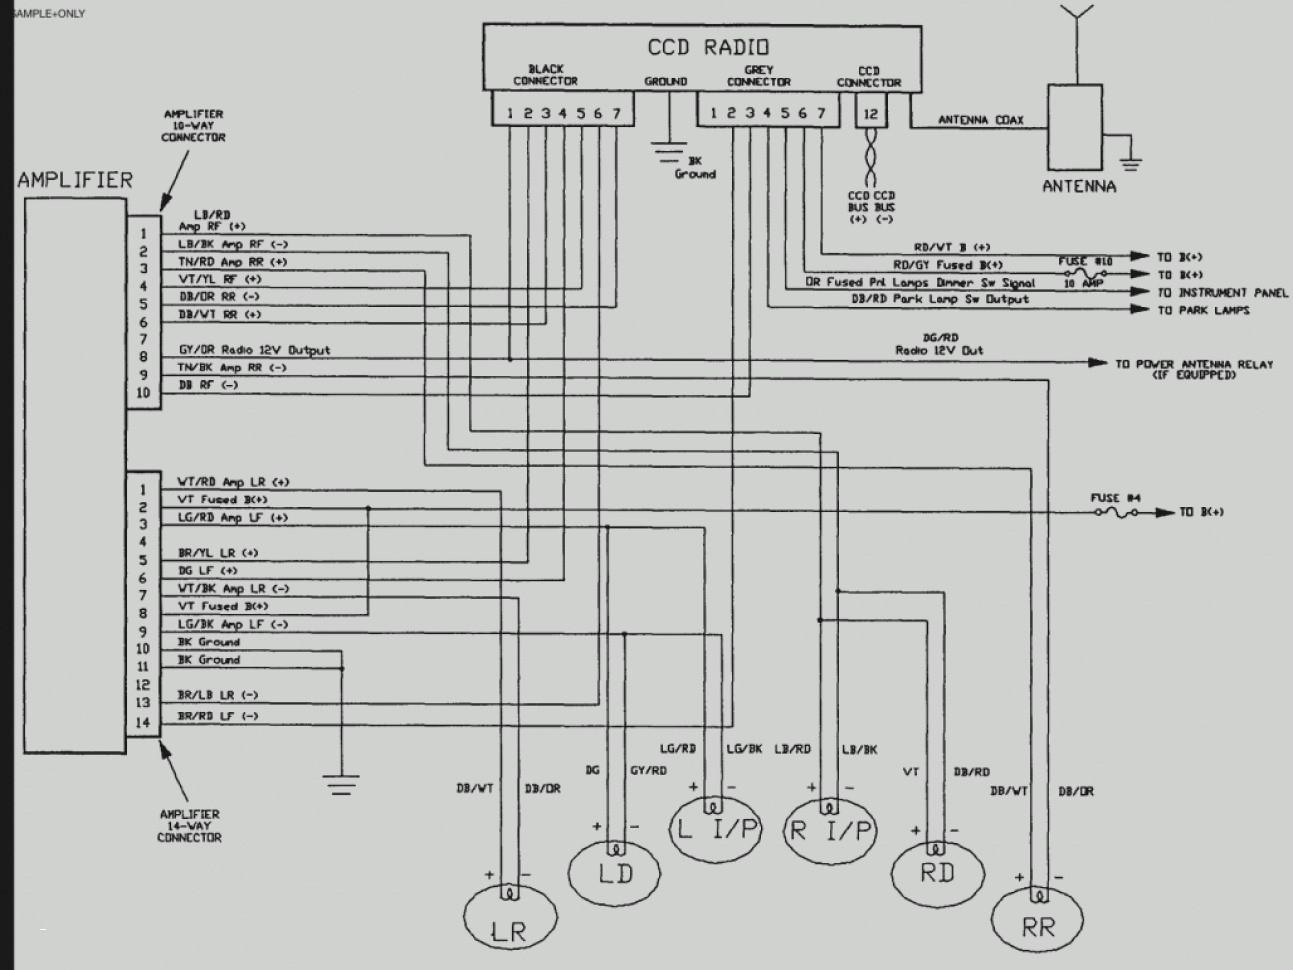 2000 Jeep Grand Cherokee Radio Wiring Diagram Best Modern 2001 Jeep Grand Cherokee Wiring Diagram